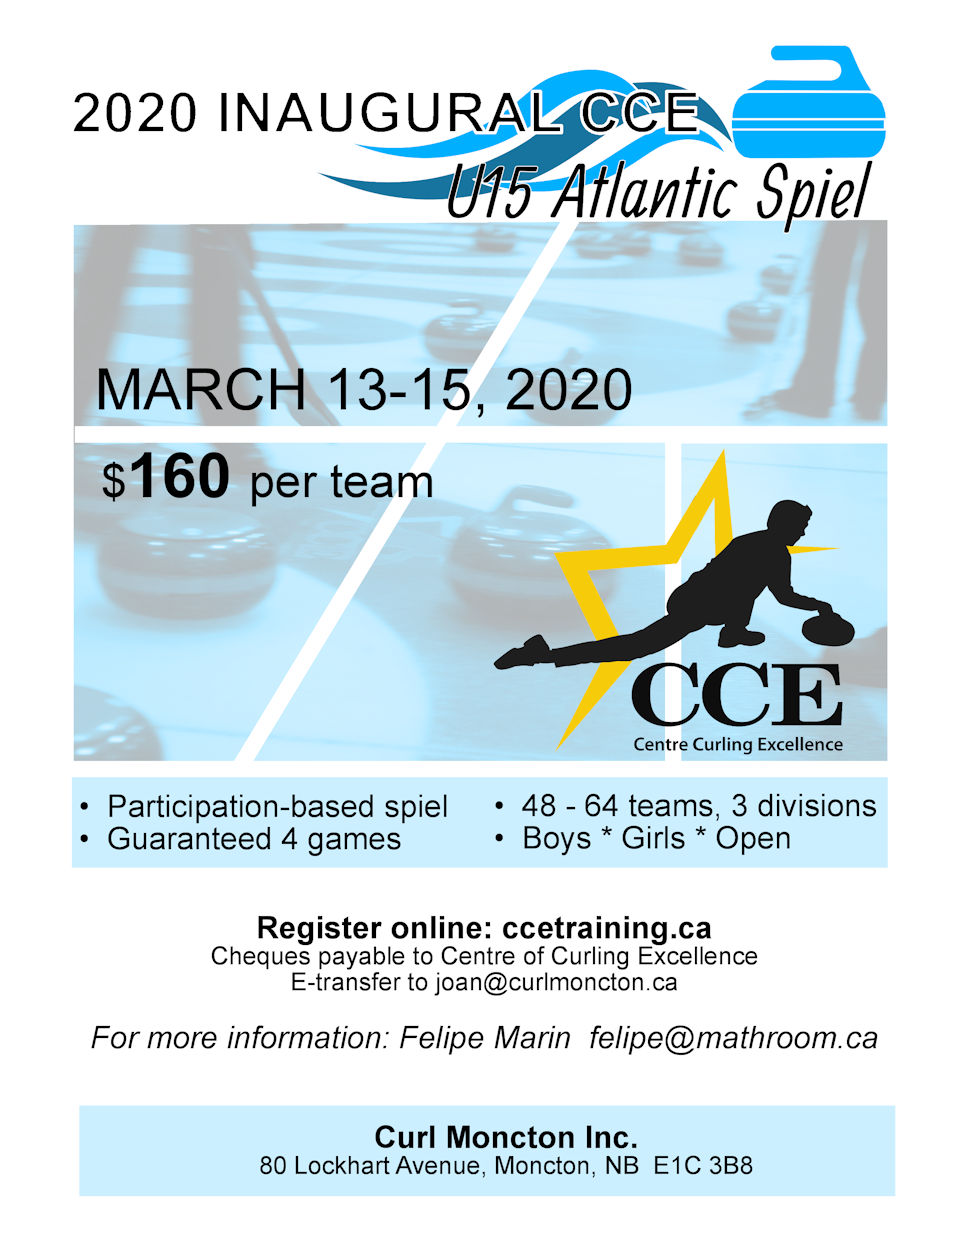 U15 Atlantic Spiel @ Curl Moncton